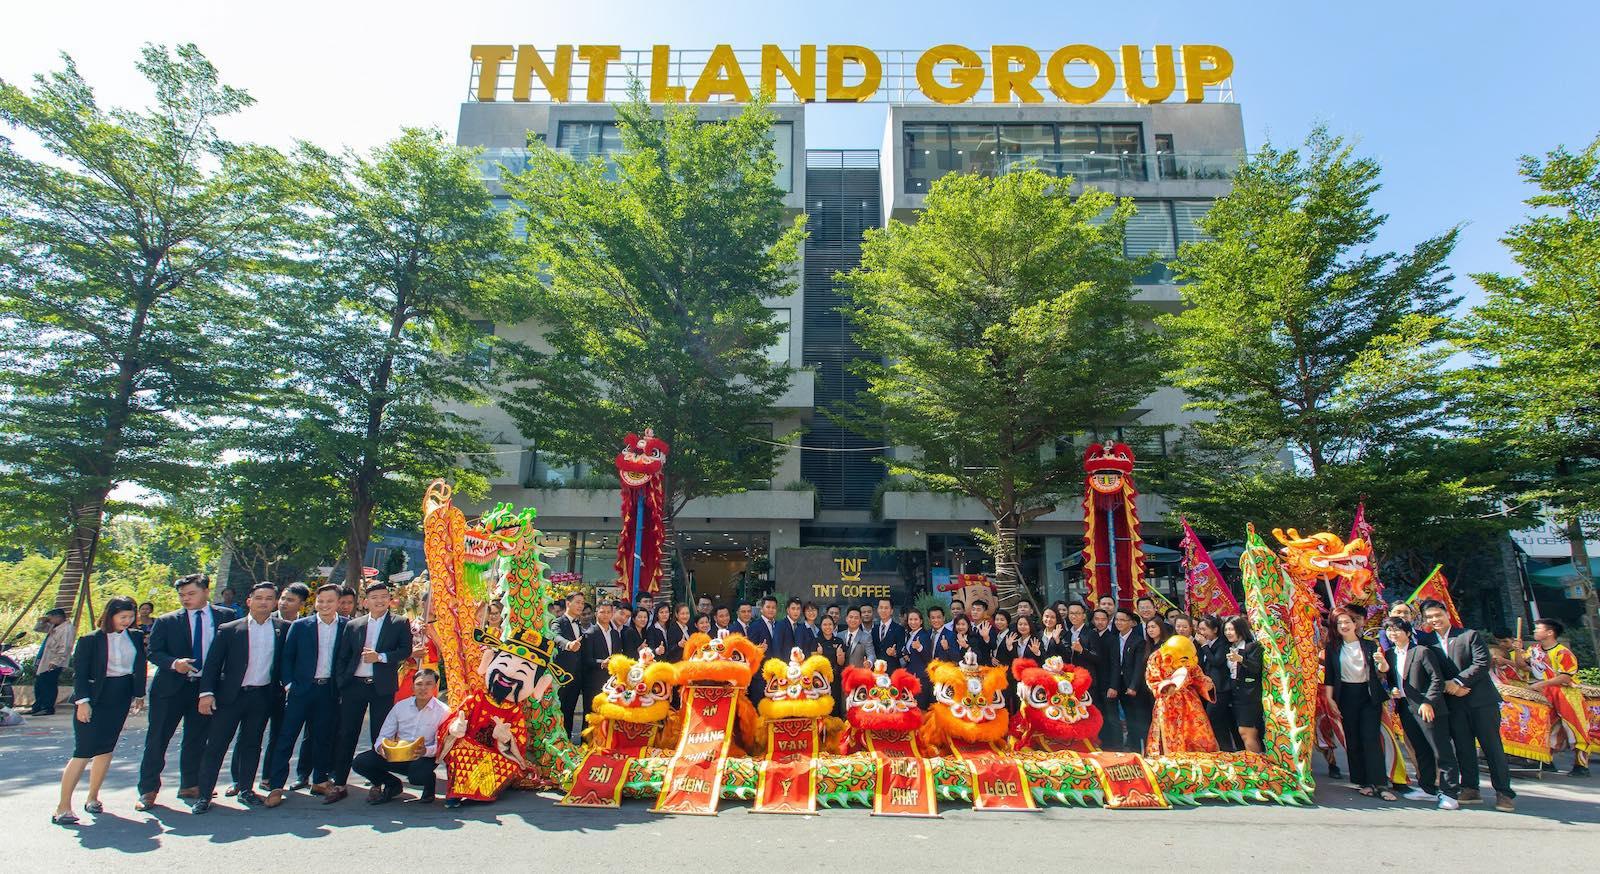 công ty tnt land group